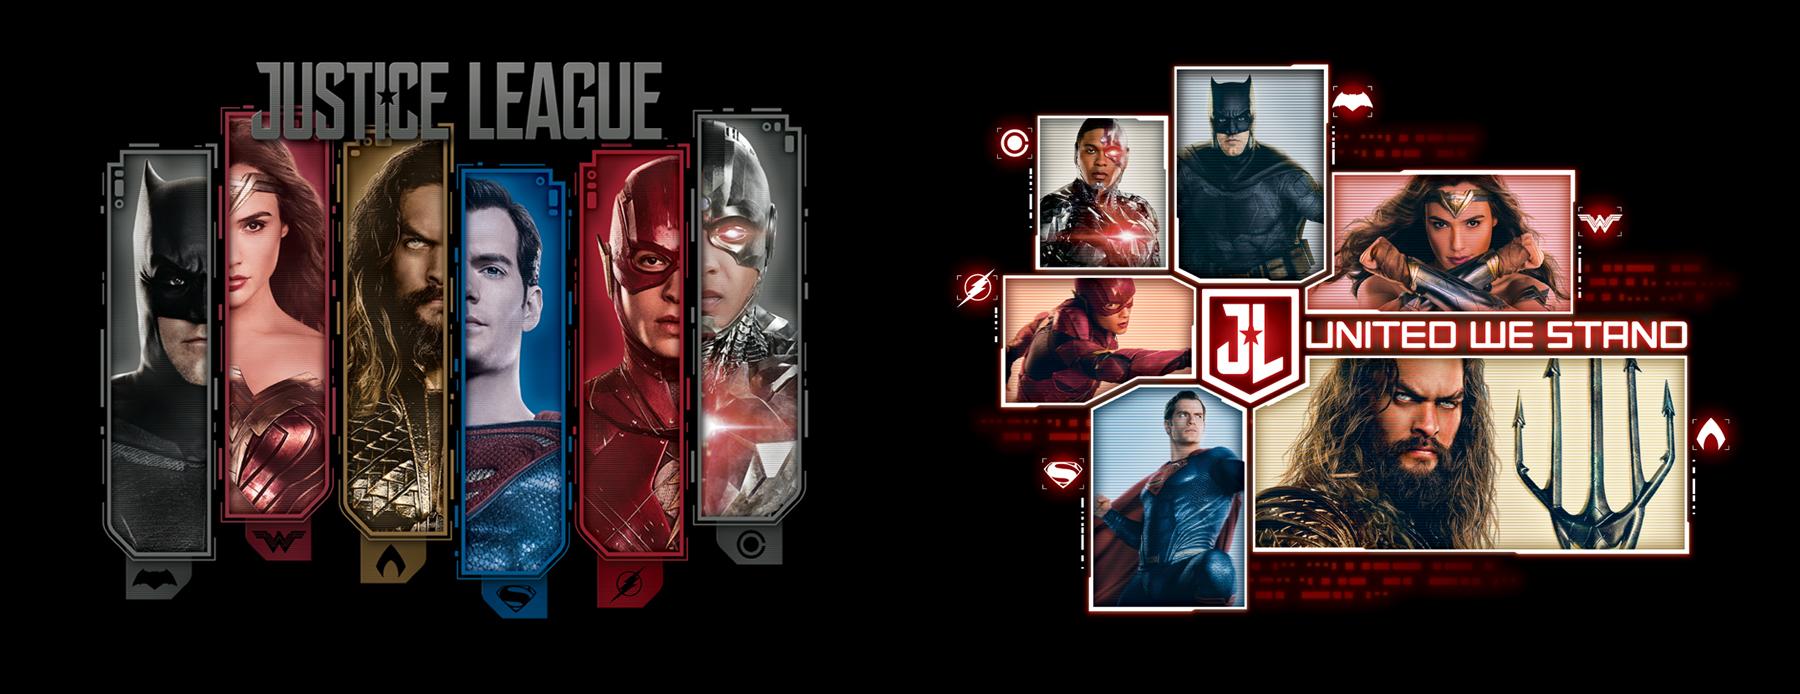 Justice League Style Guide Design - Panel 3